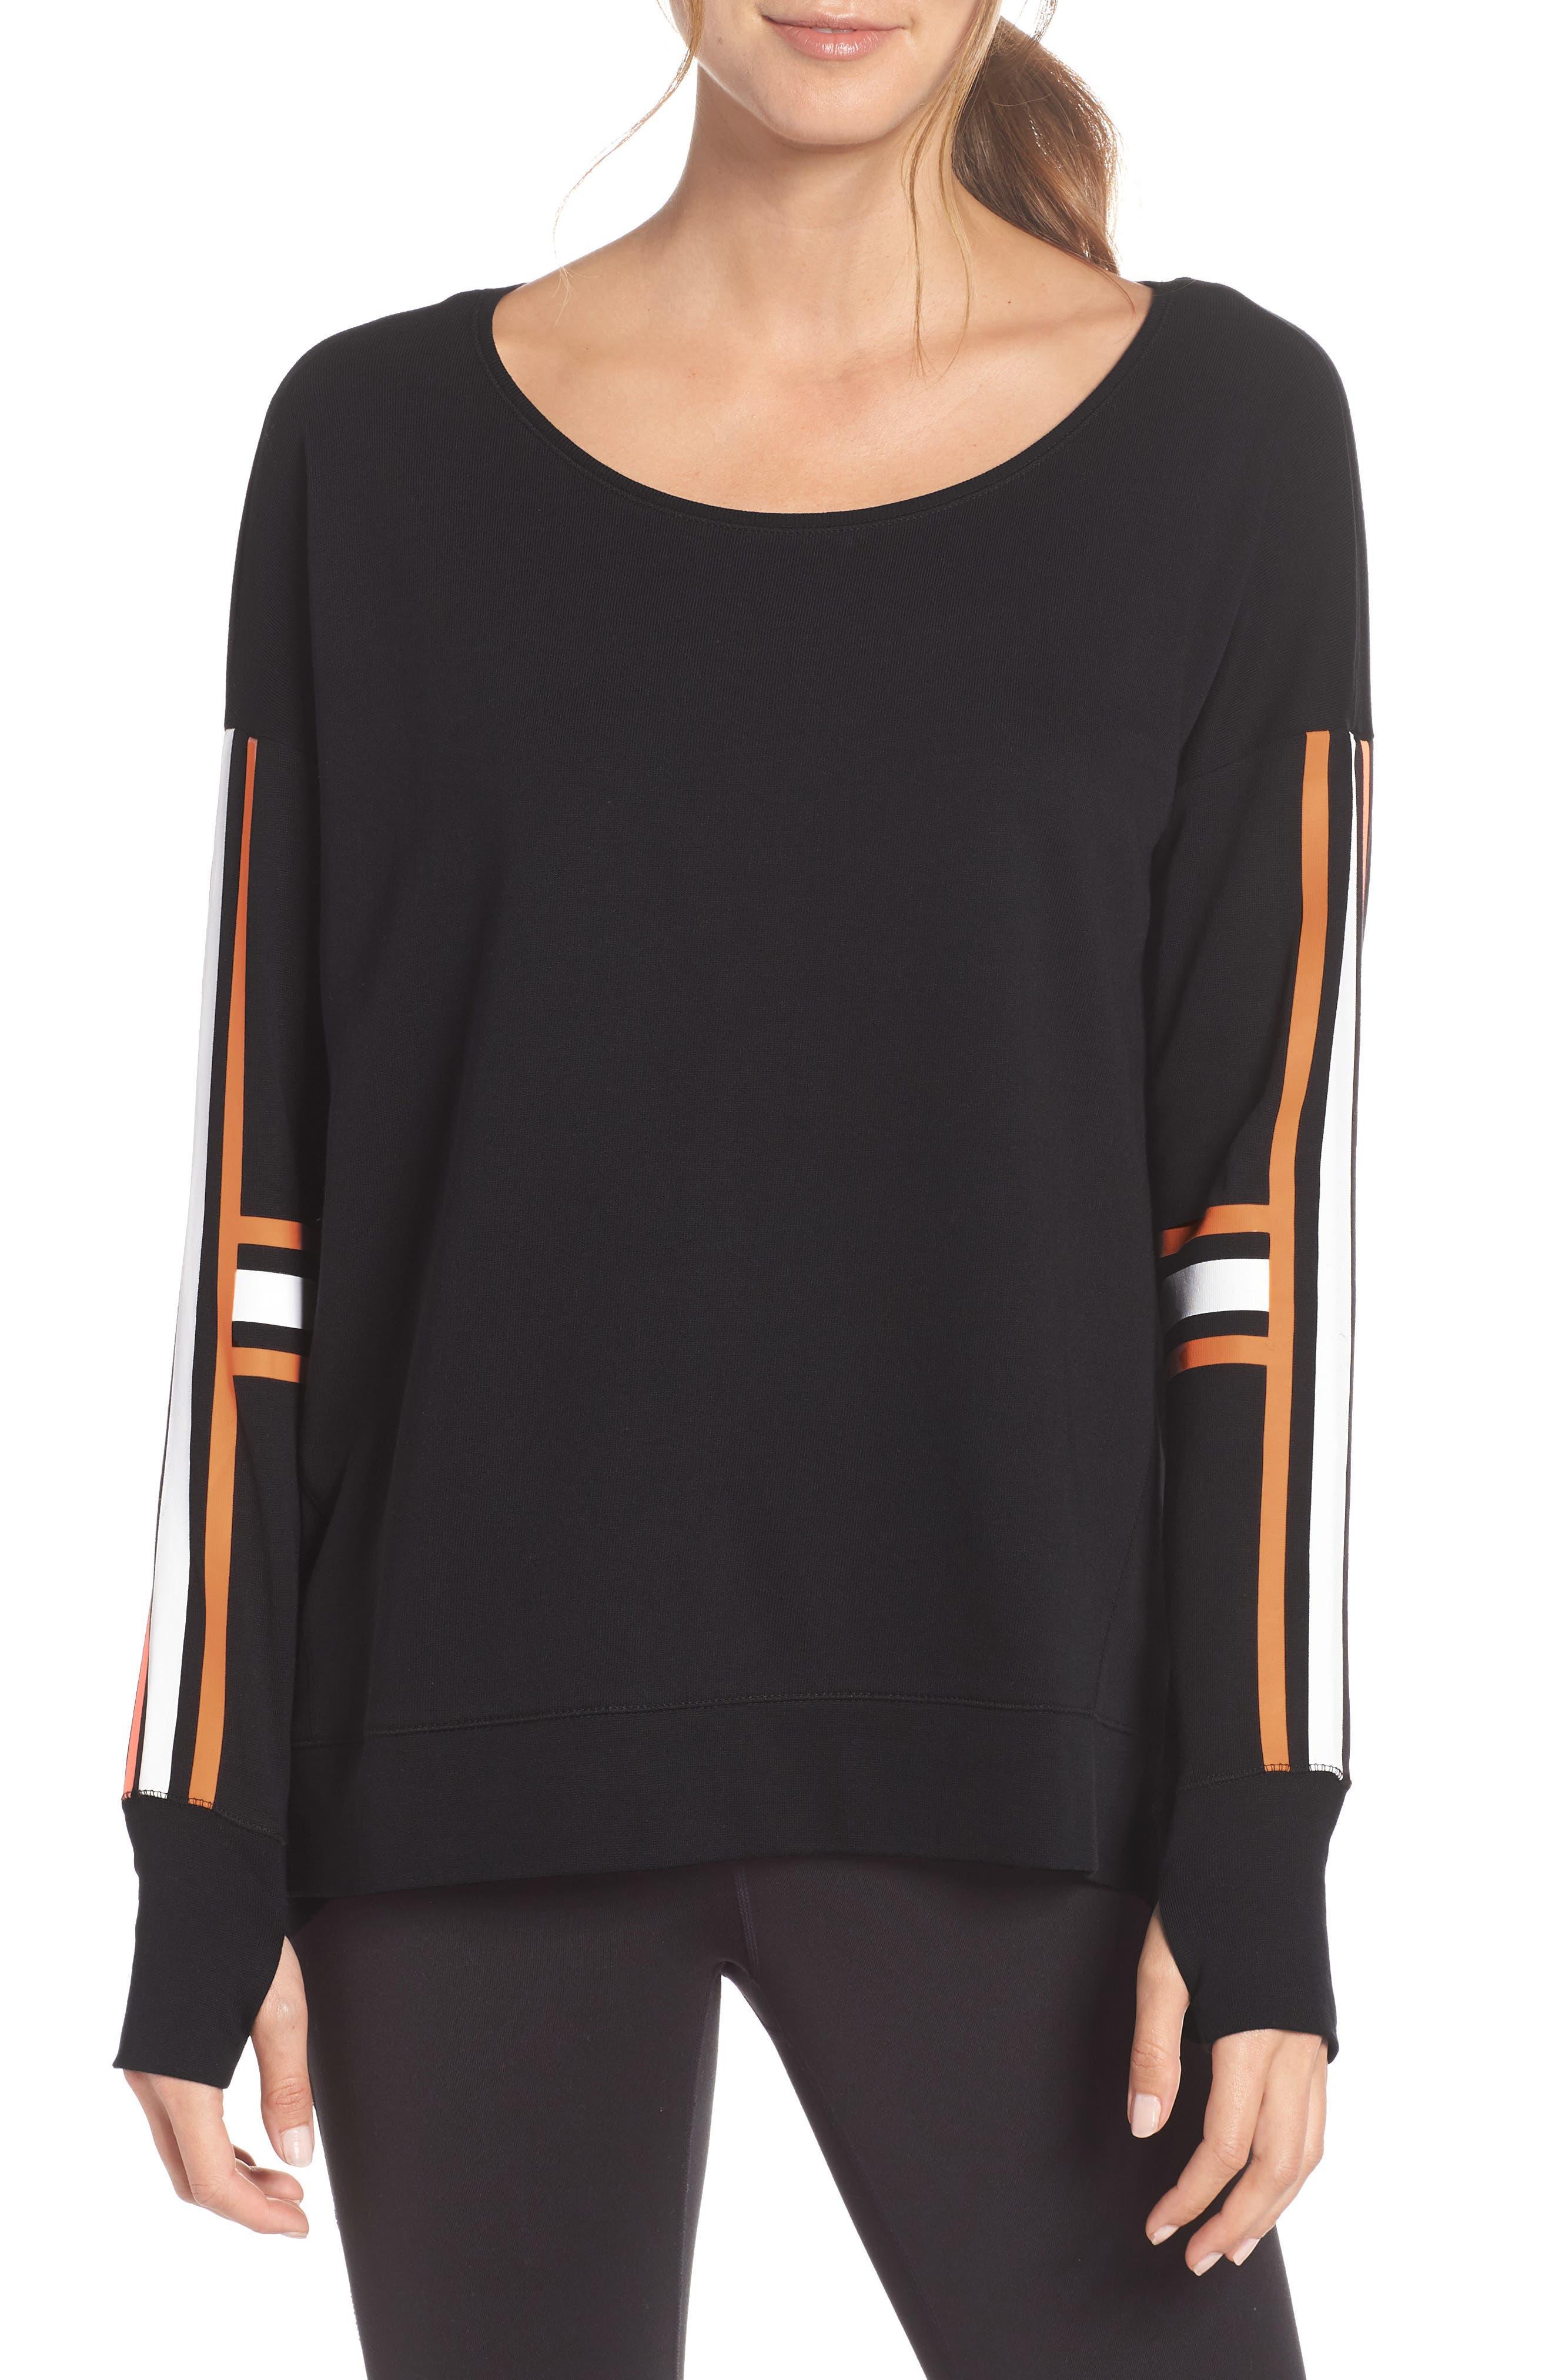 Simhasana Sweatshirt,                         Main,                         color, 001